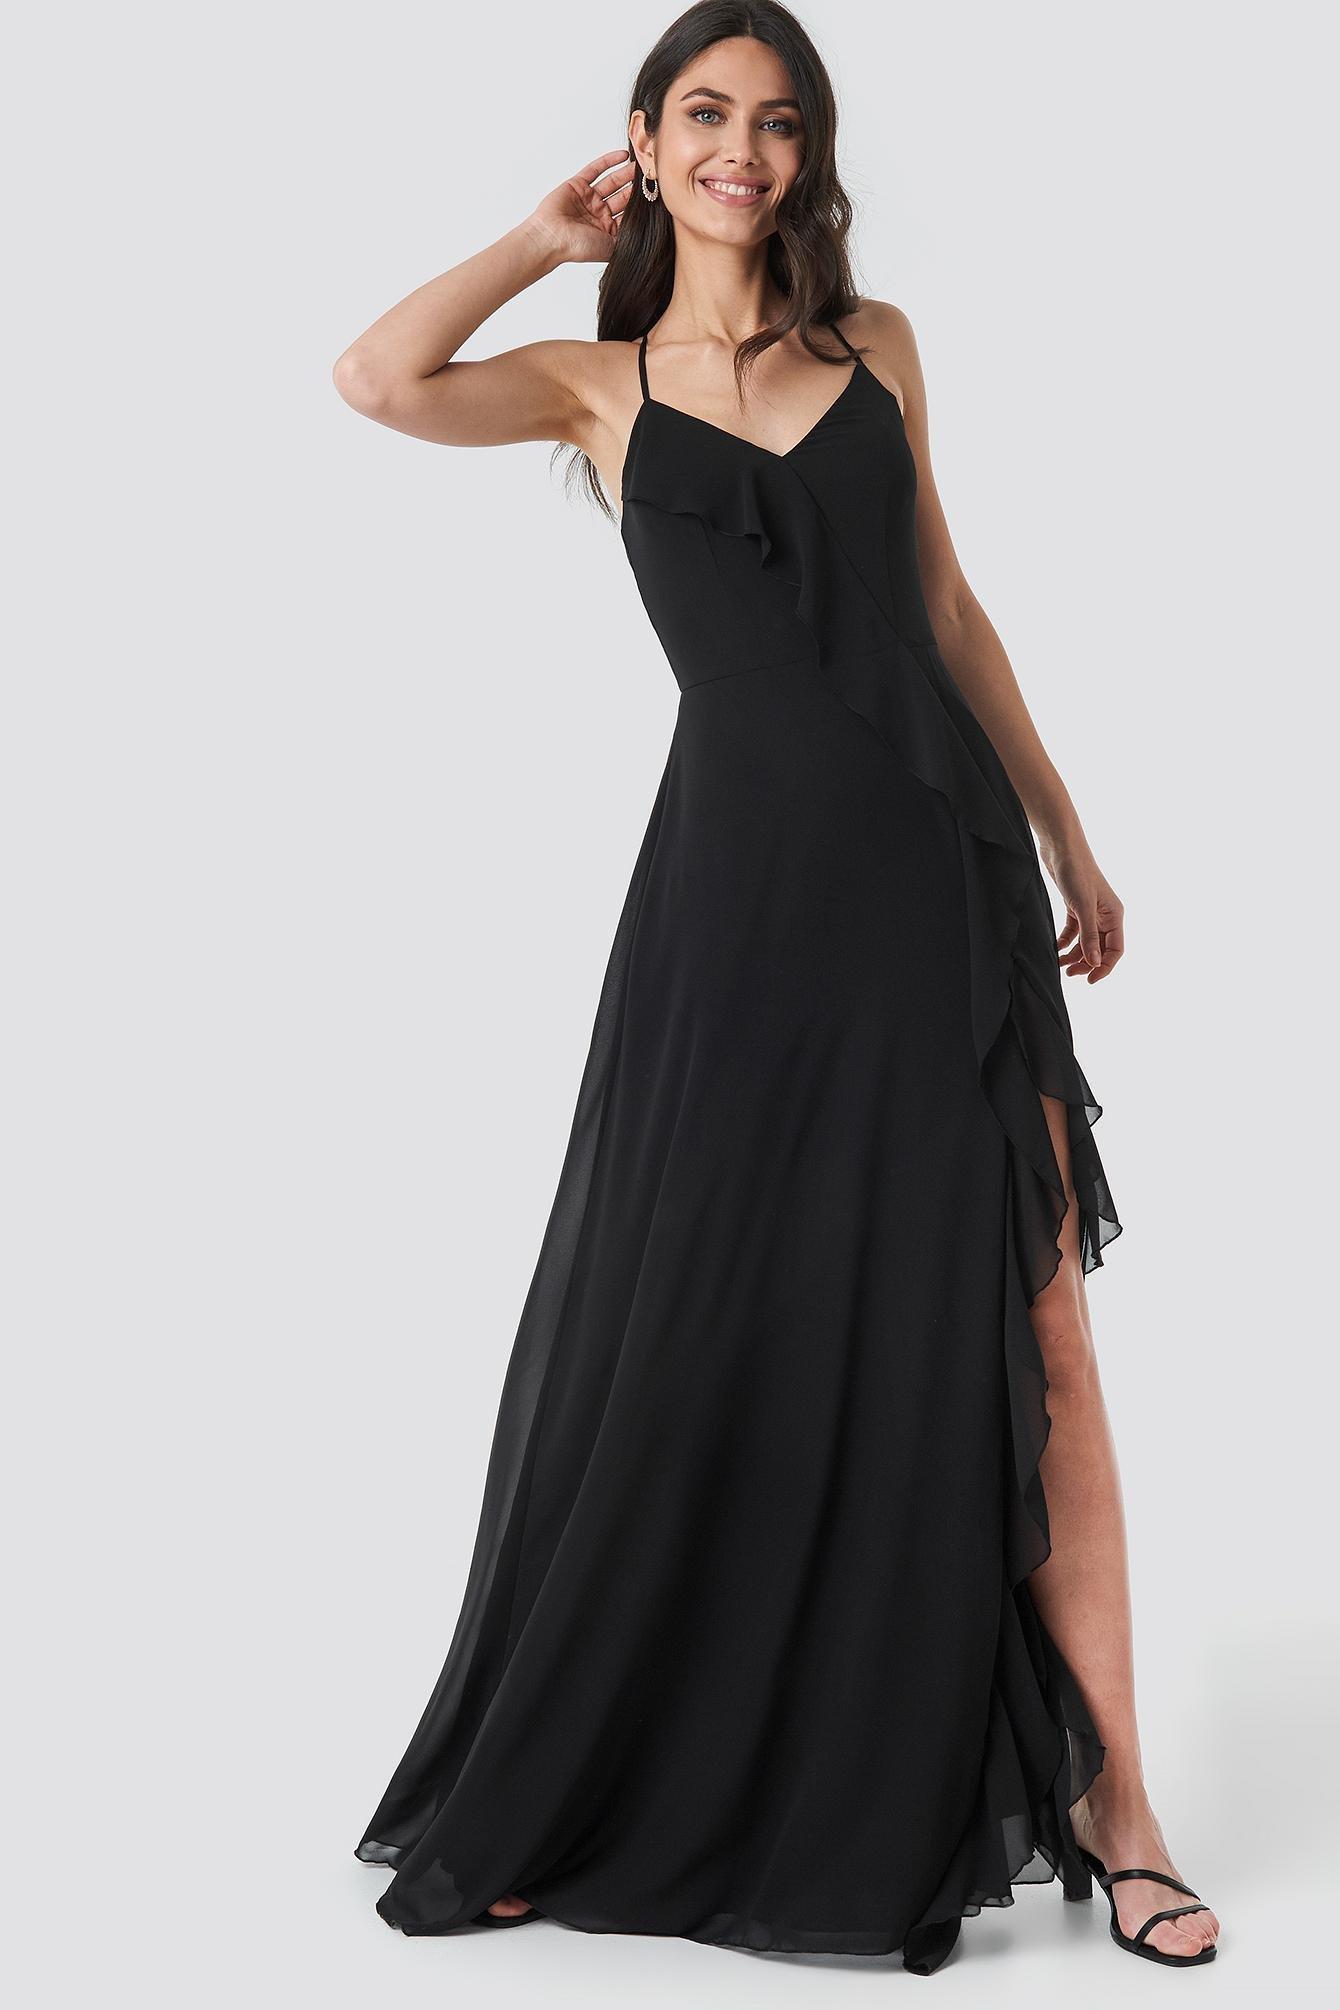 b31543568ca3f Trendyol Frilly Evening Dress Gown Black in Black - Lyst